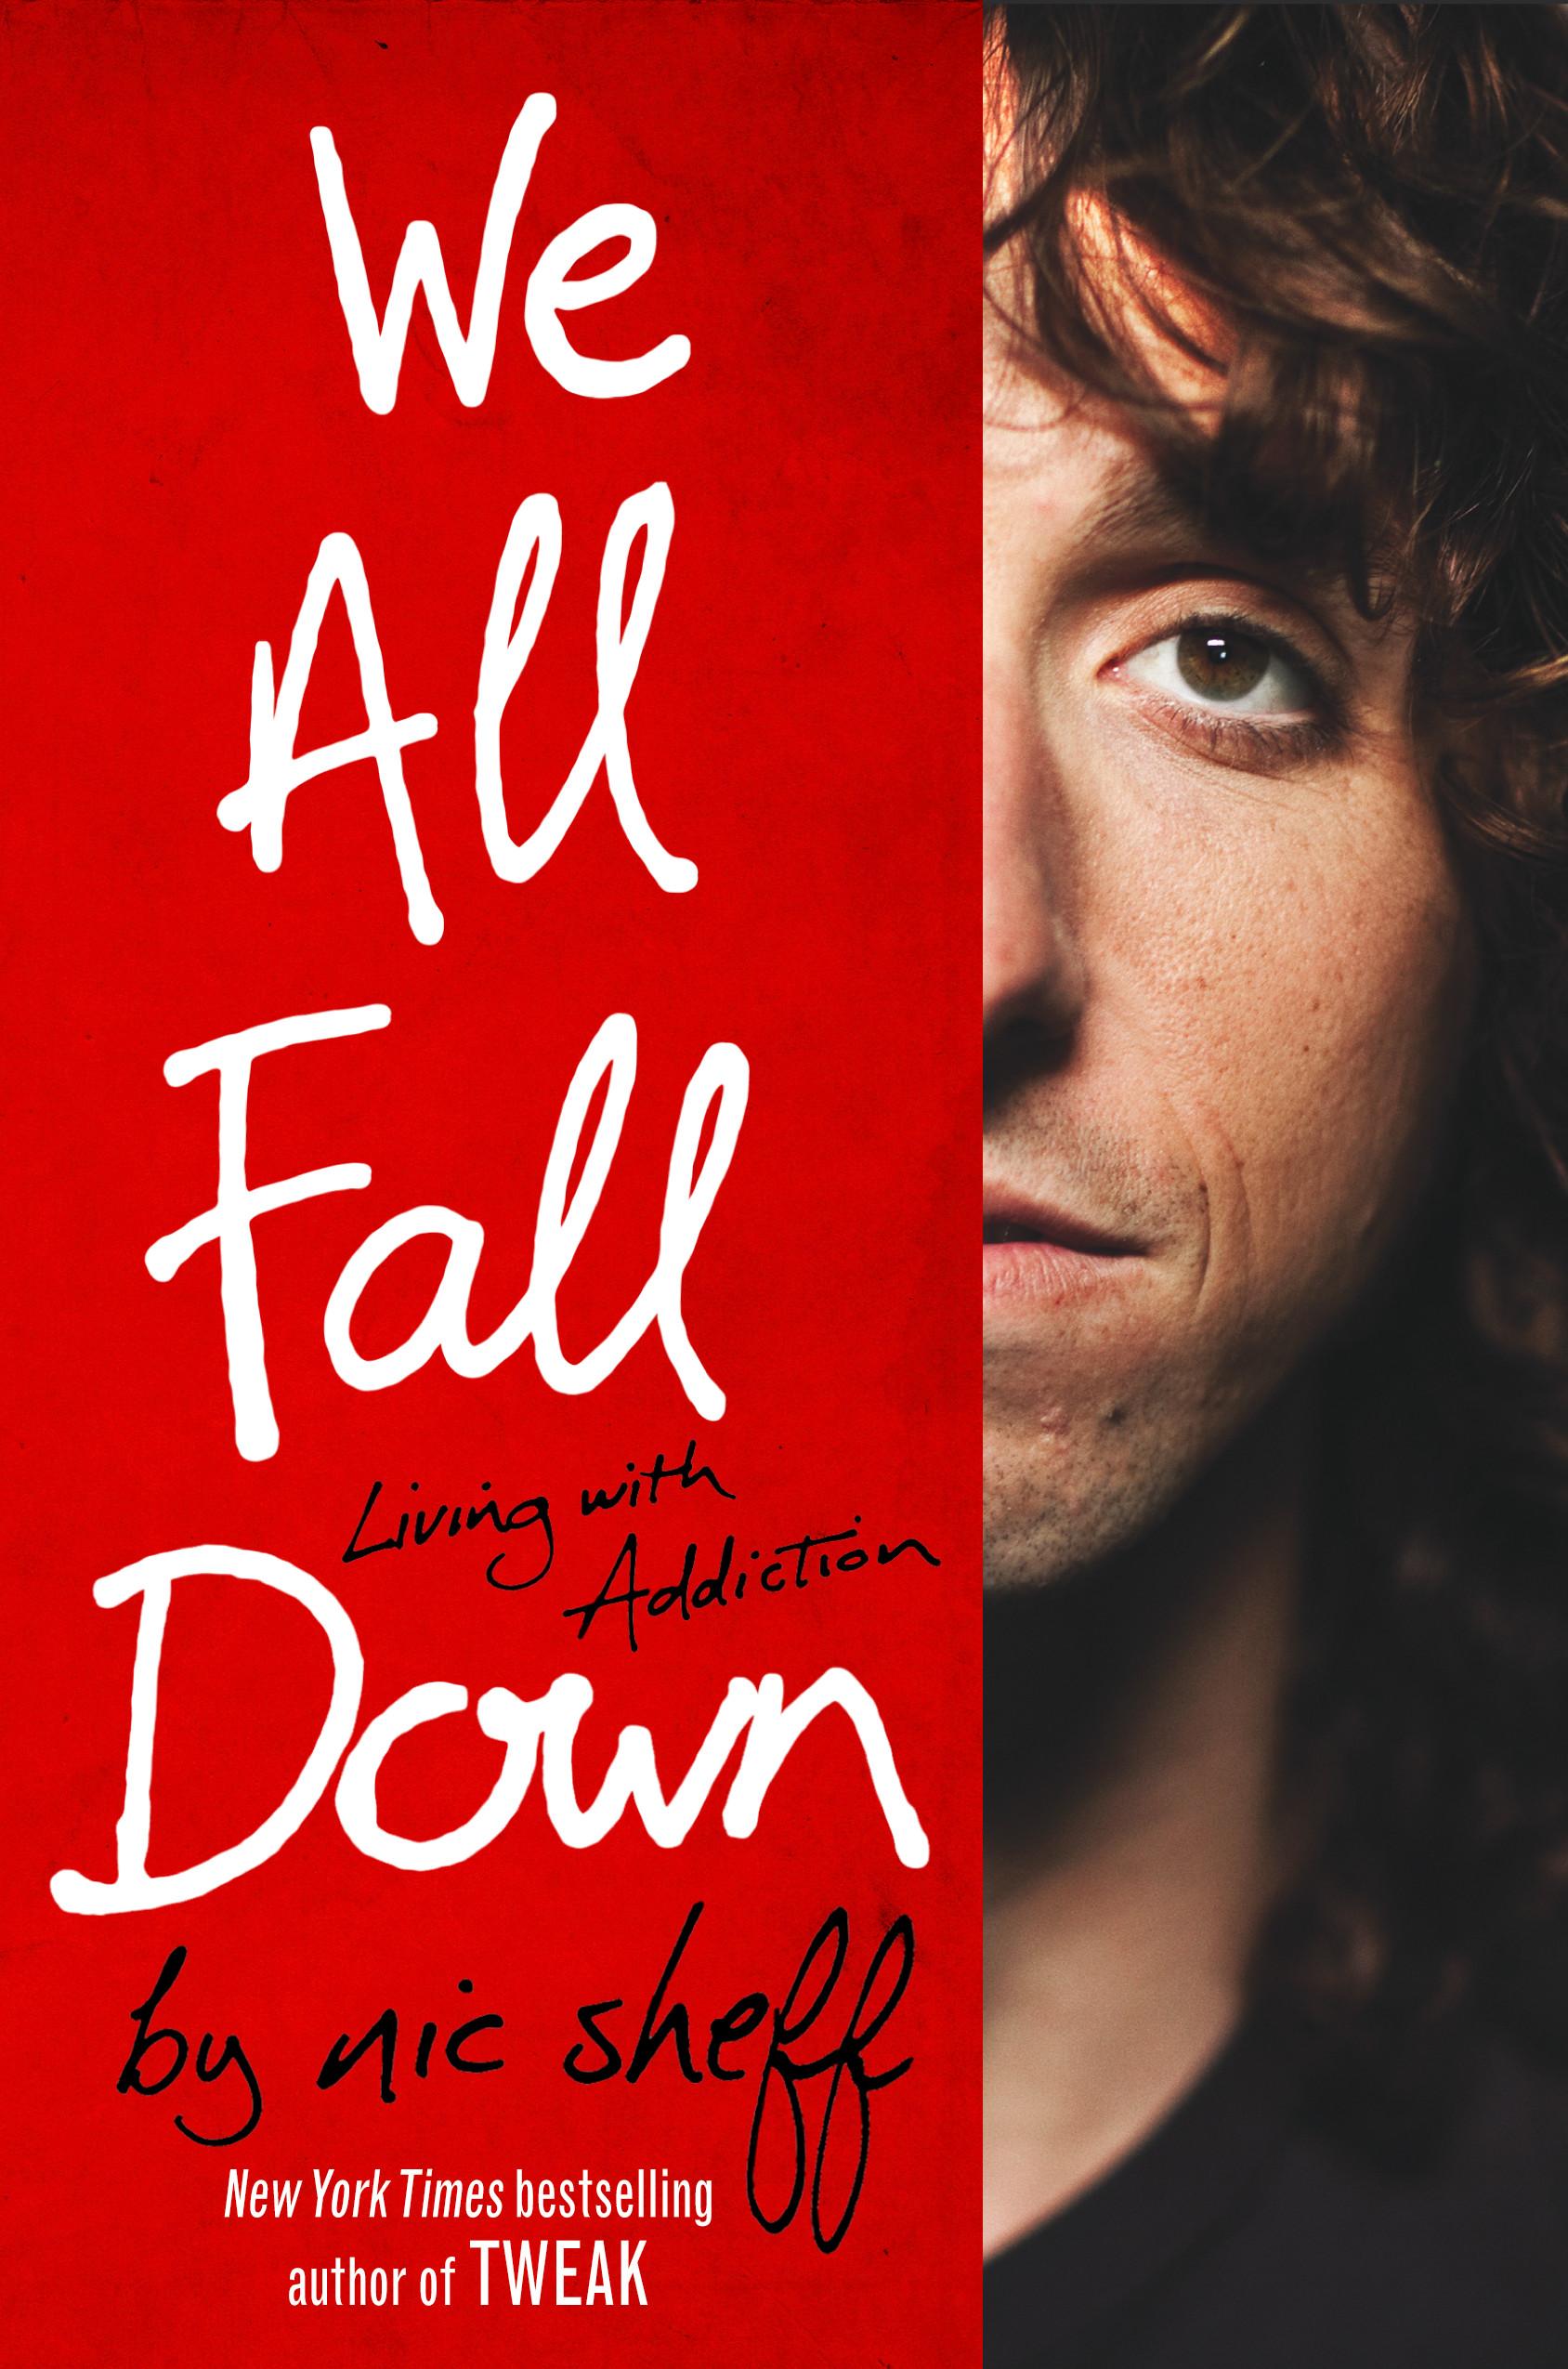 we all fall down nic sheff essay Tweak - growing up on methamphetamines audiobook by nic sheff tweak nic  sheff we all fall down - living with addiction audiobook by nic sheff we all.